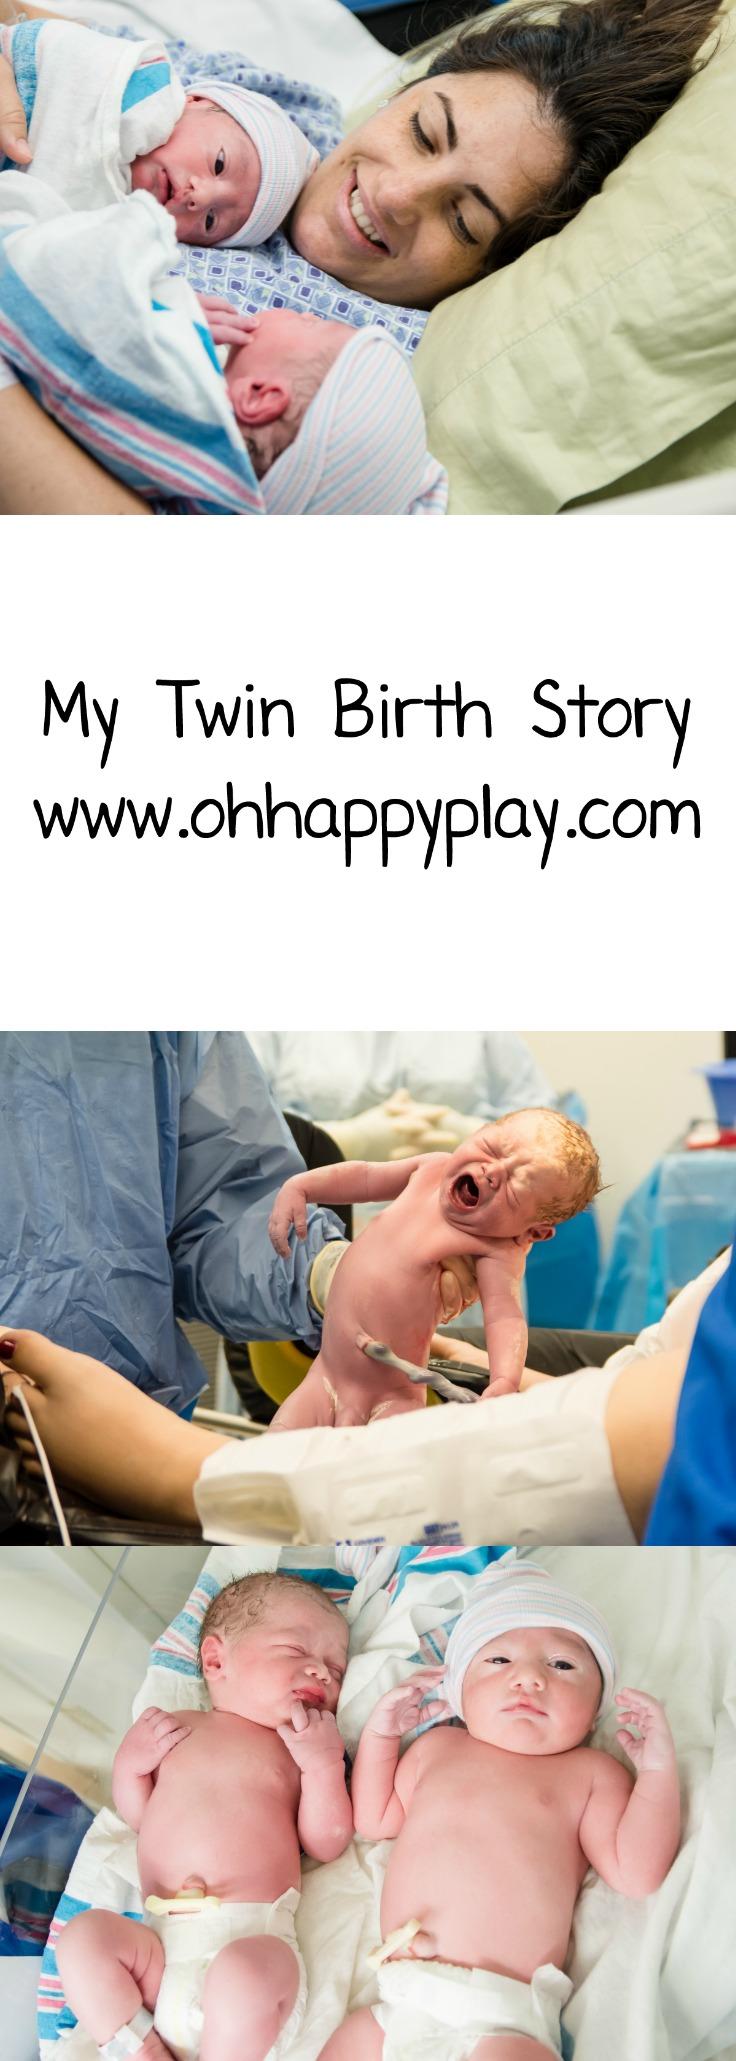 newborn photography, birth story, twin birth story, vaginal twin birth, natural twin birth, twin mom, newborn twins, birth photography, document childbirth, twins, fraternal twins